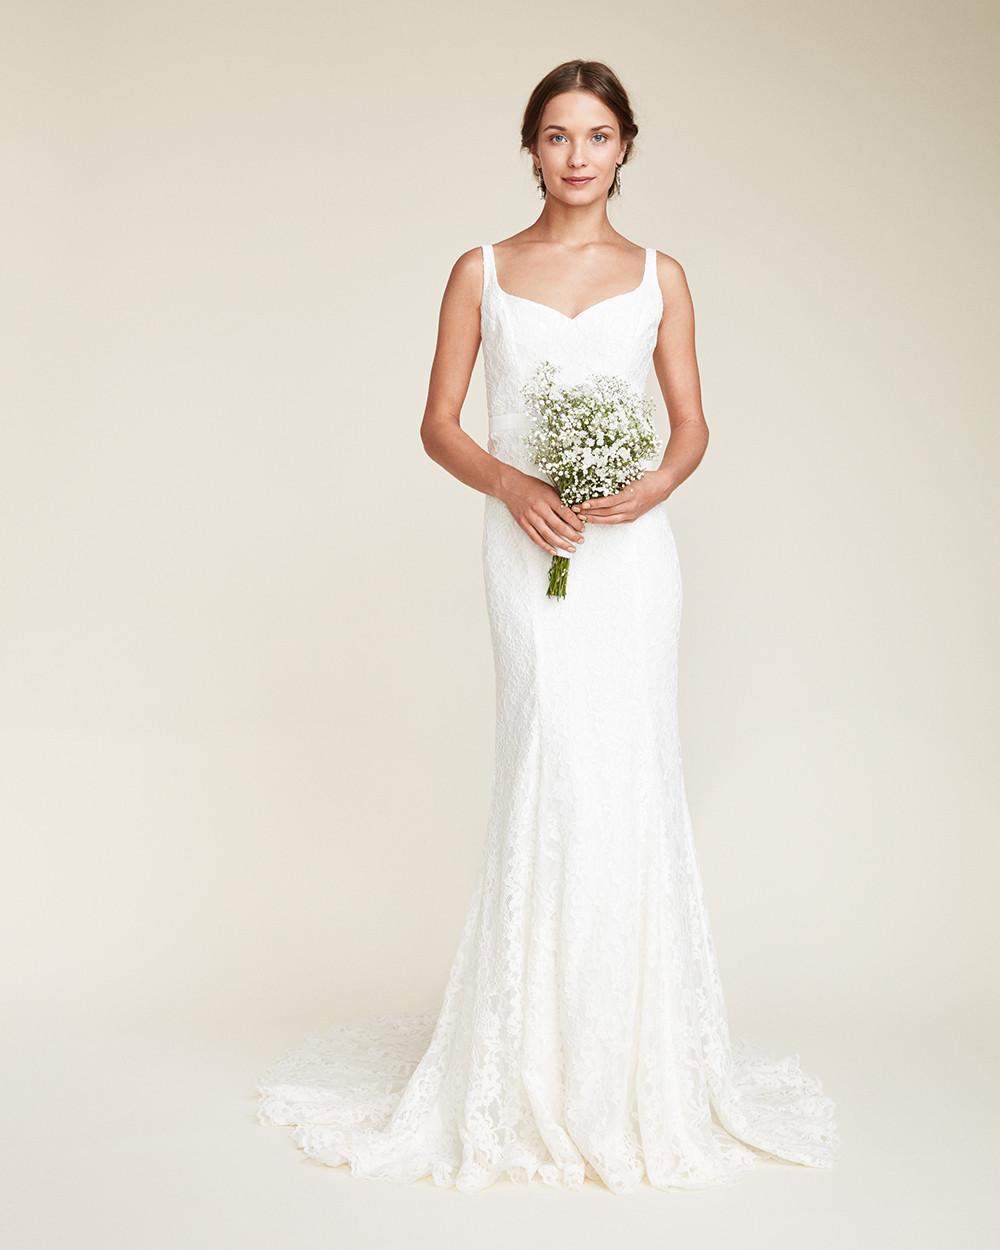 Snap Nicole miller Dakota Bridal Gown in White Lyst photos on Pinterest